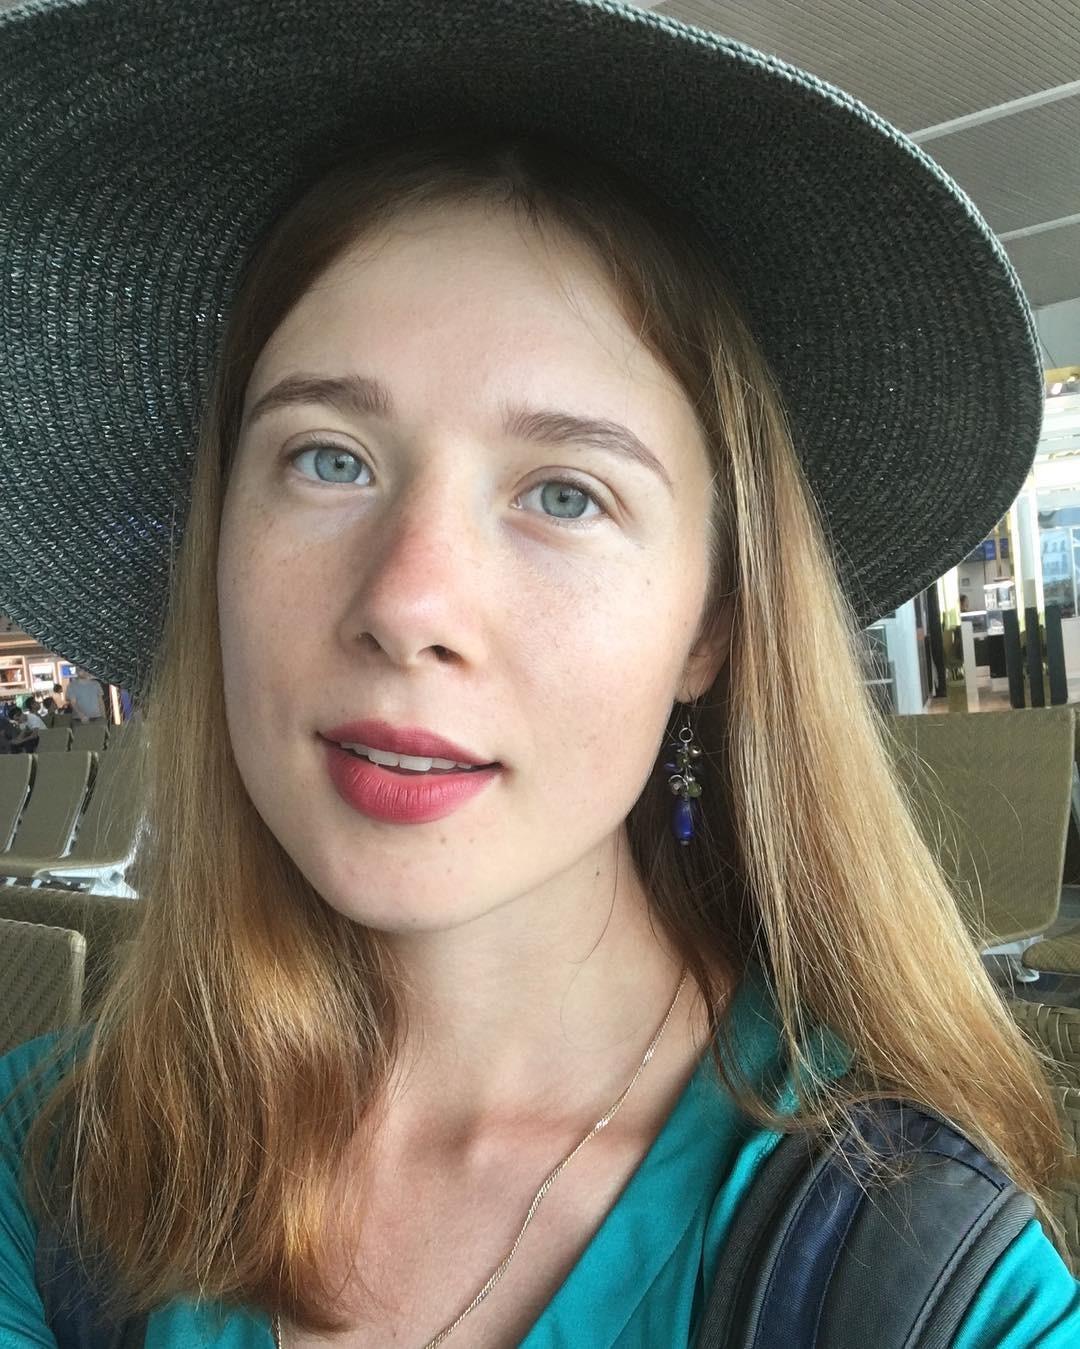 Tatiana (24) berasal dari Tver, sekitar tiga jam dari Moskow. Ia lulus dari Institut Negeri Hubungan Internasional Moskow (MGIMO) dan fasih berbahasa Indonesia. Kini, ia tinggal di Singapura bersama suaminya.